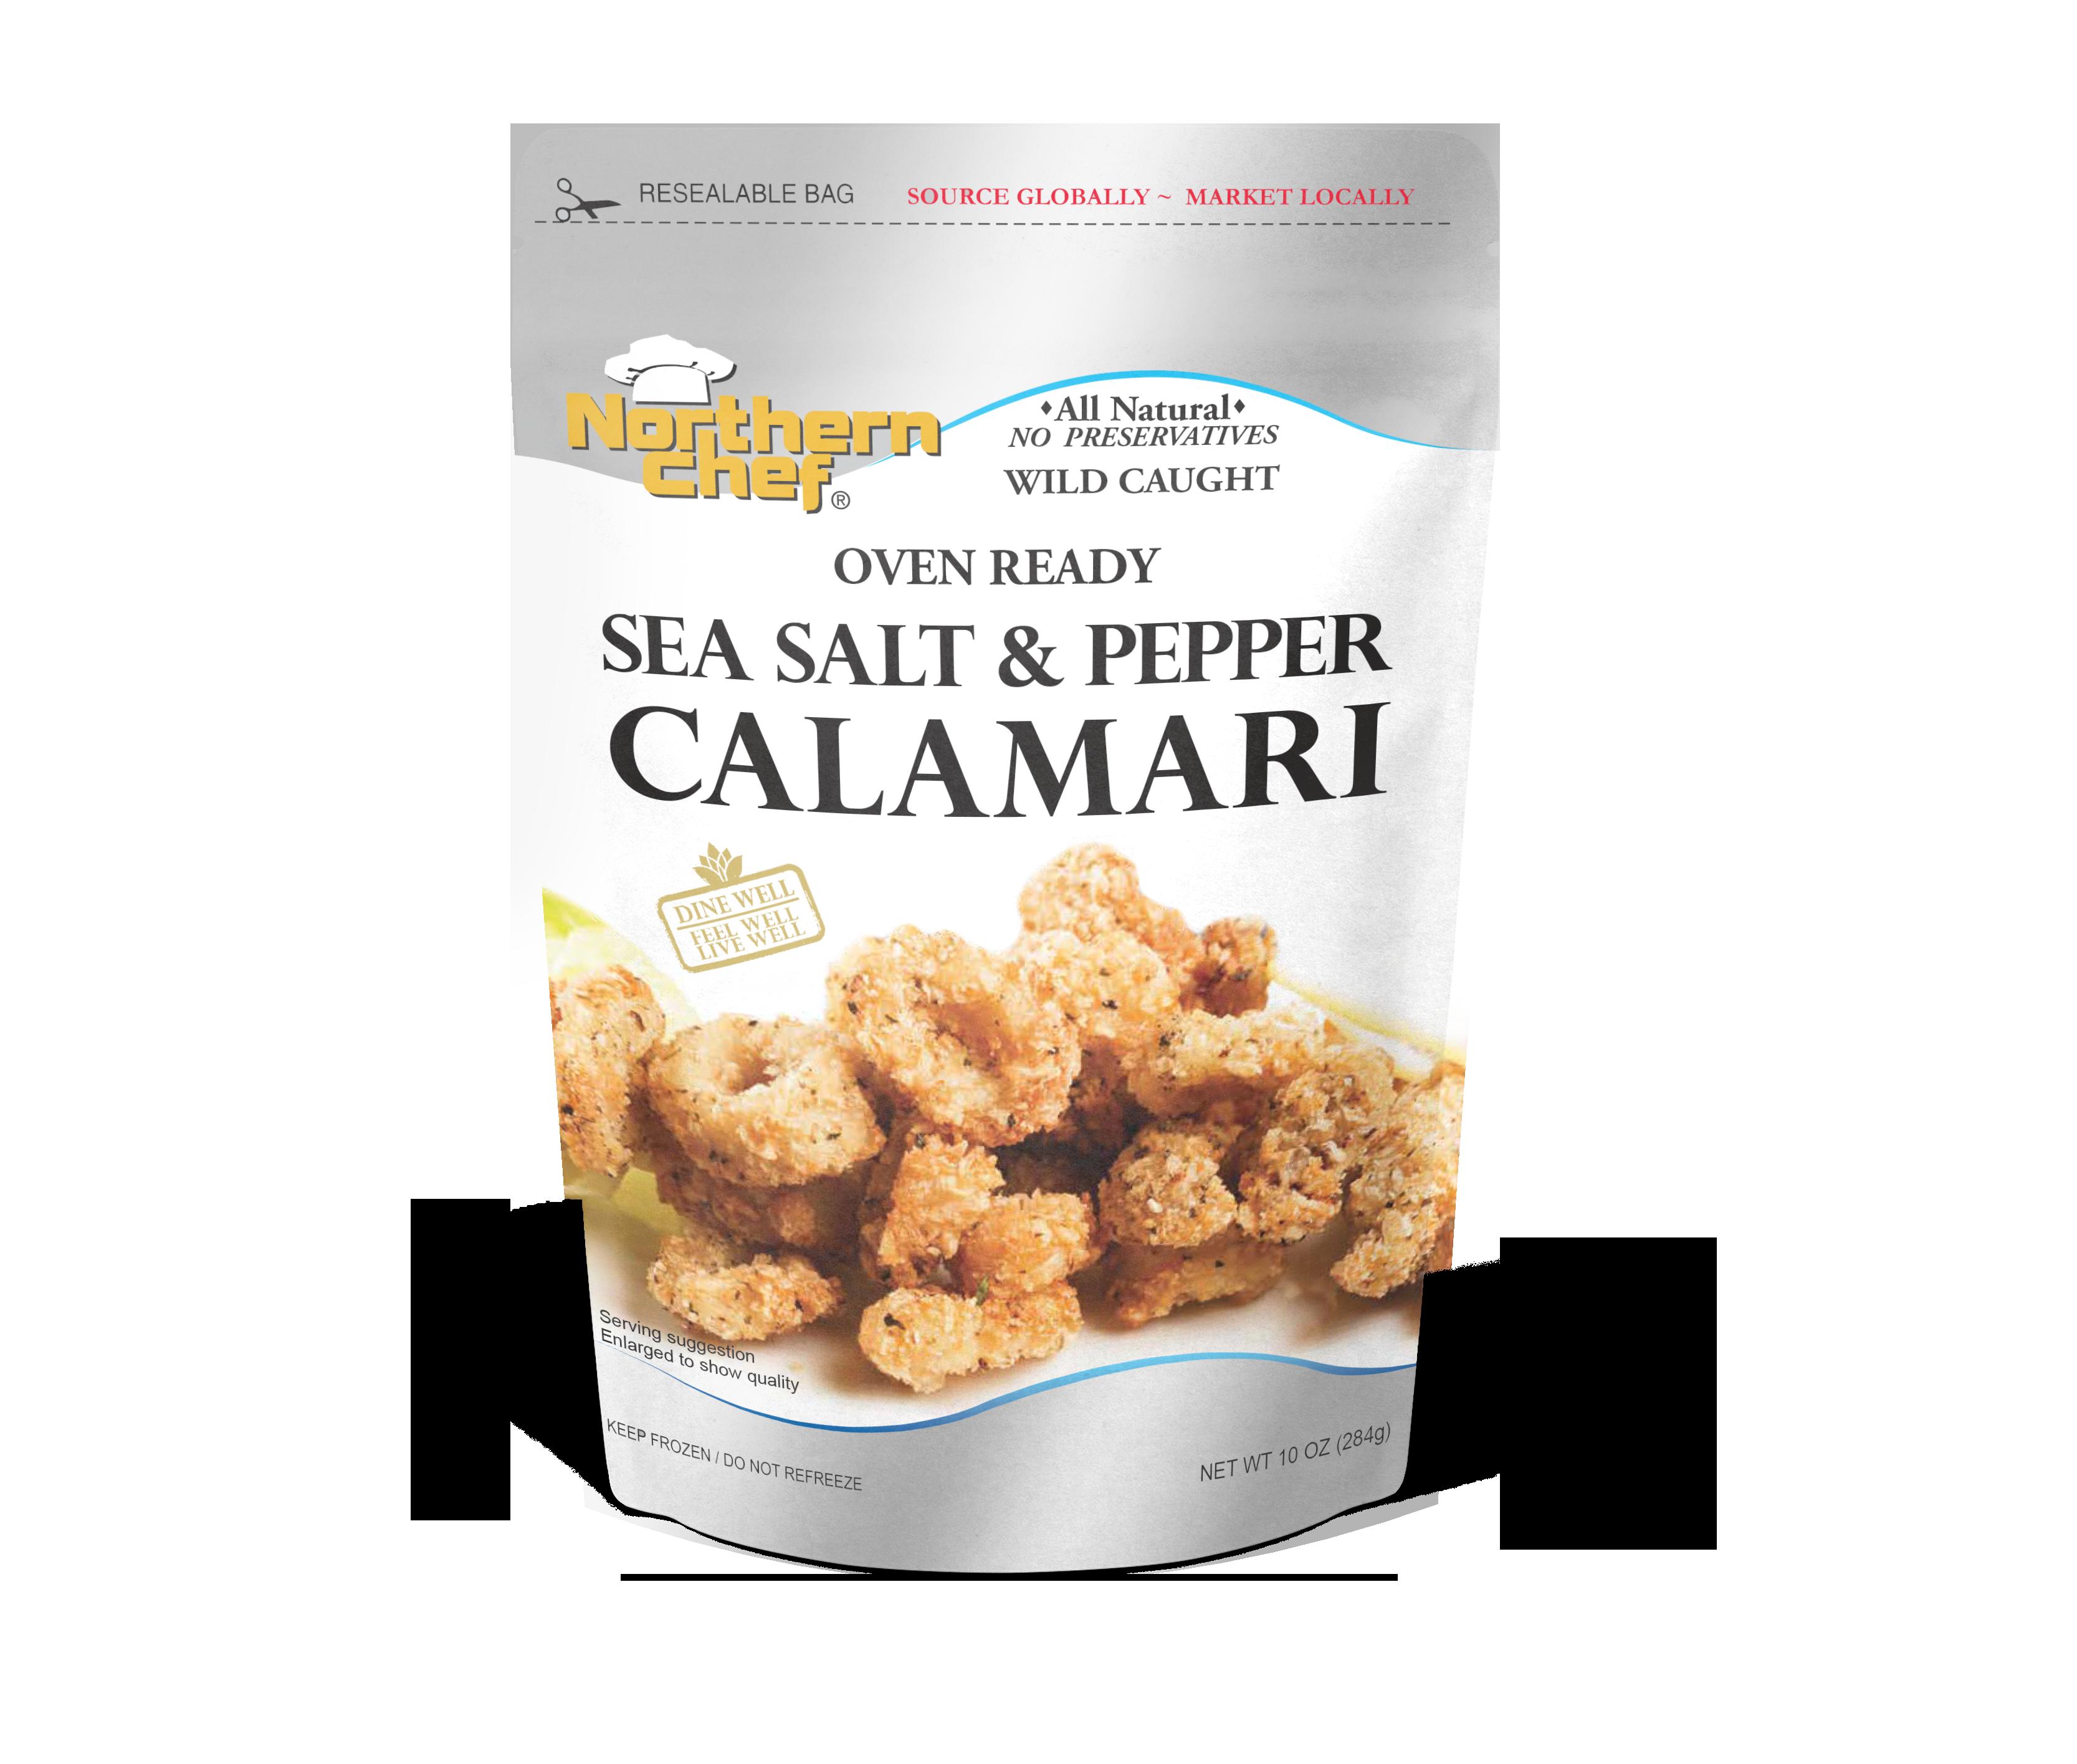 Sea salt&pepper calamari